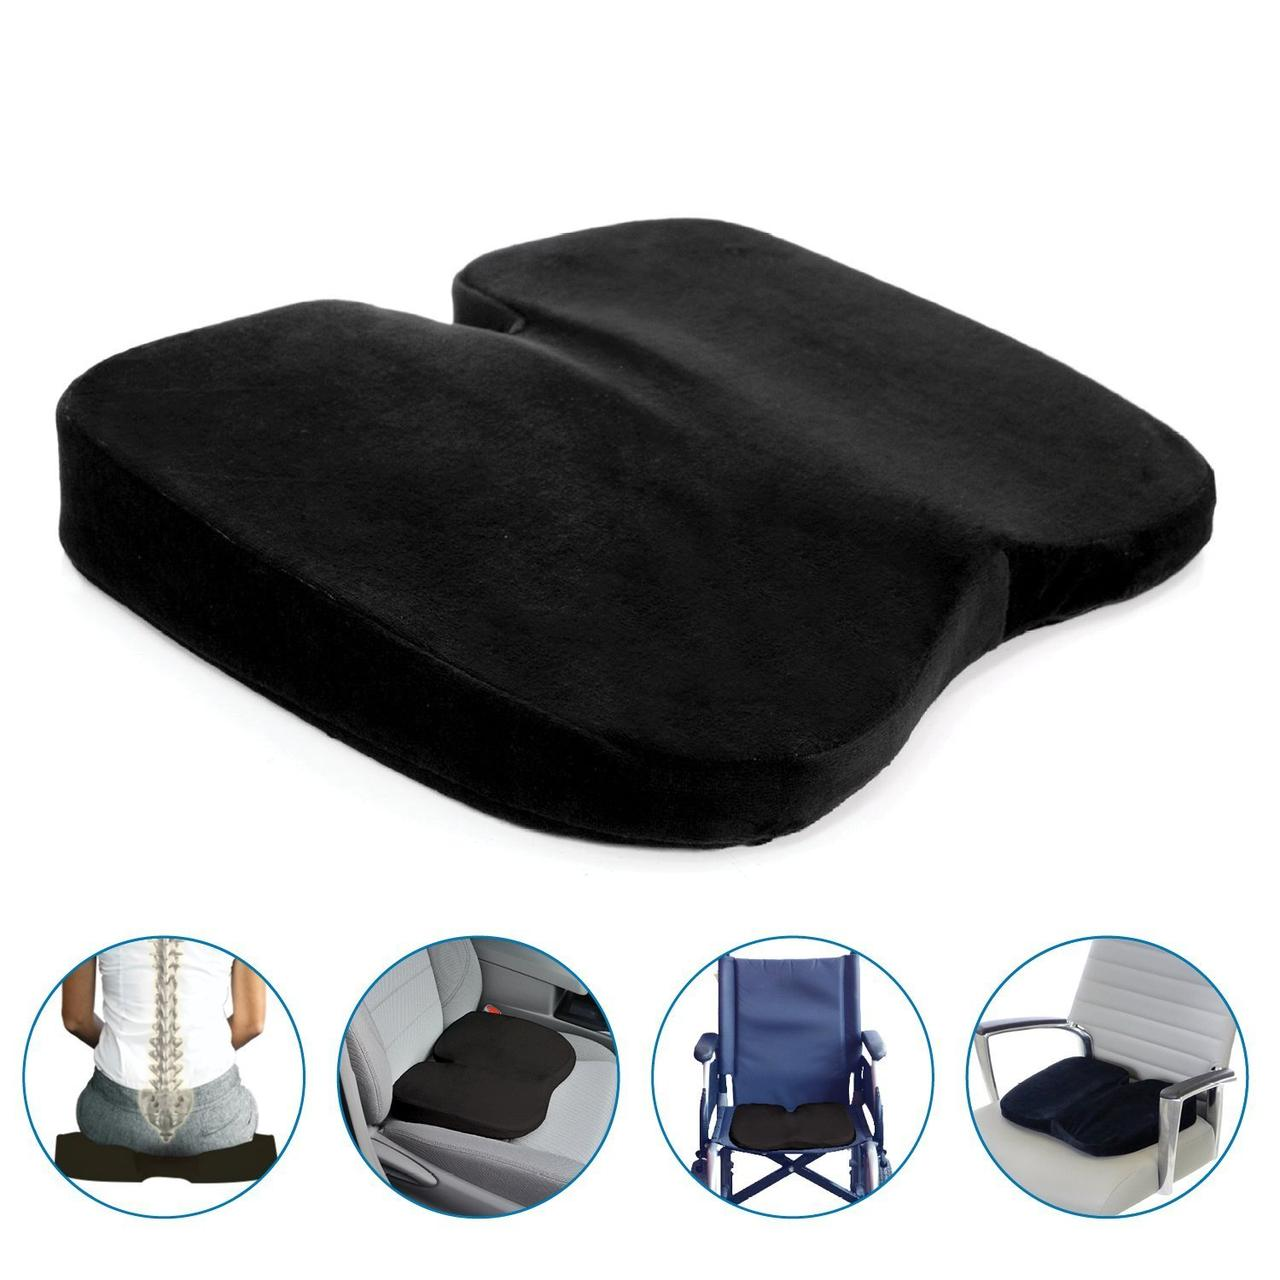 Ортопедическая подушка для сидения Milliard Orthopedic Coccyx Wedge Pillow